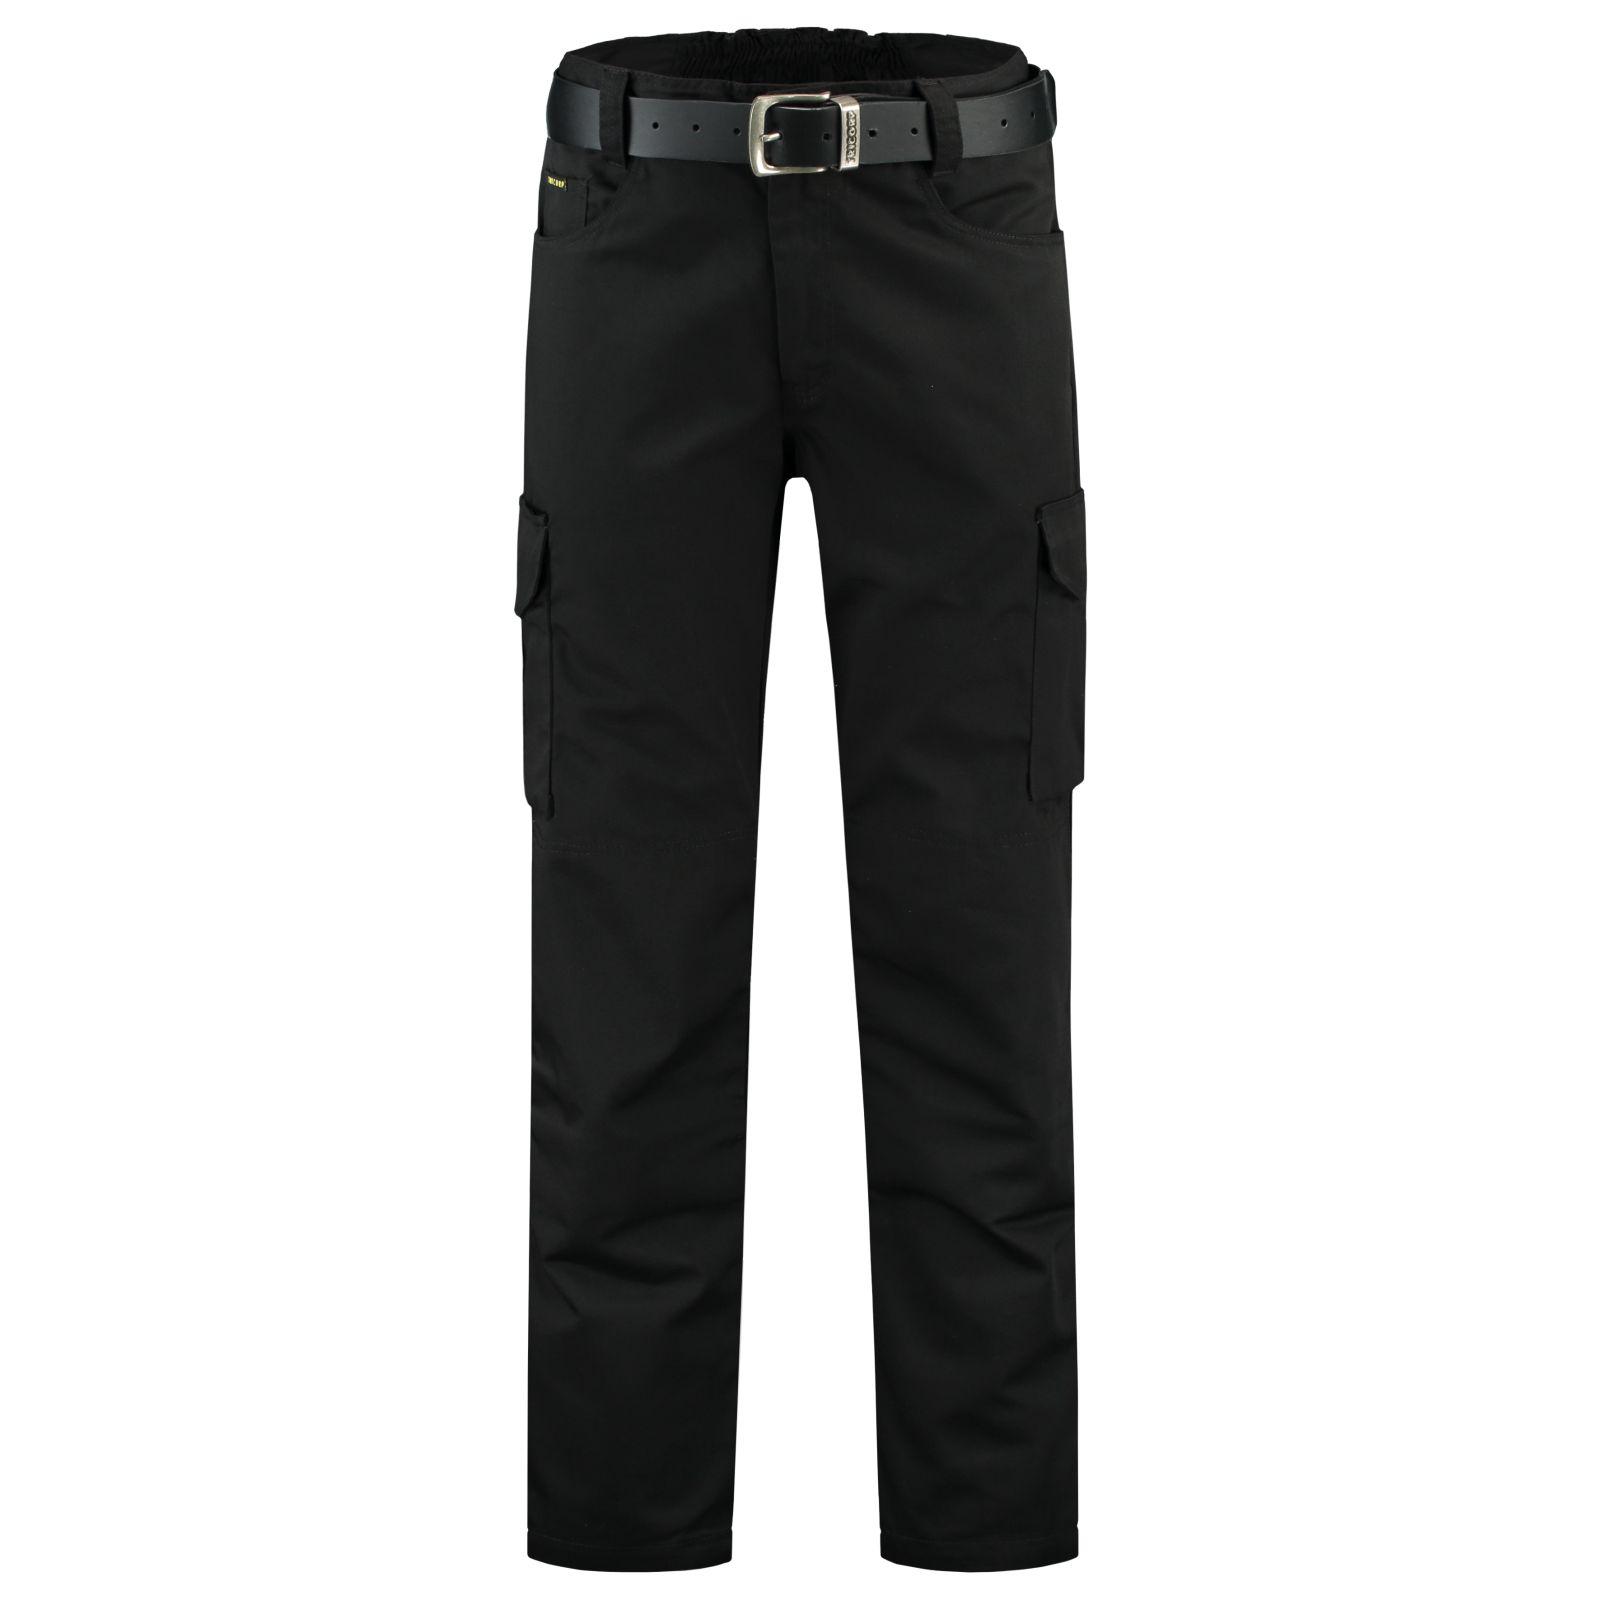 Tricorp Broeken 502008-TUB2000 zwart(Black)